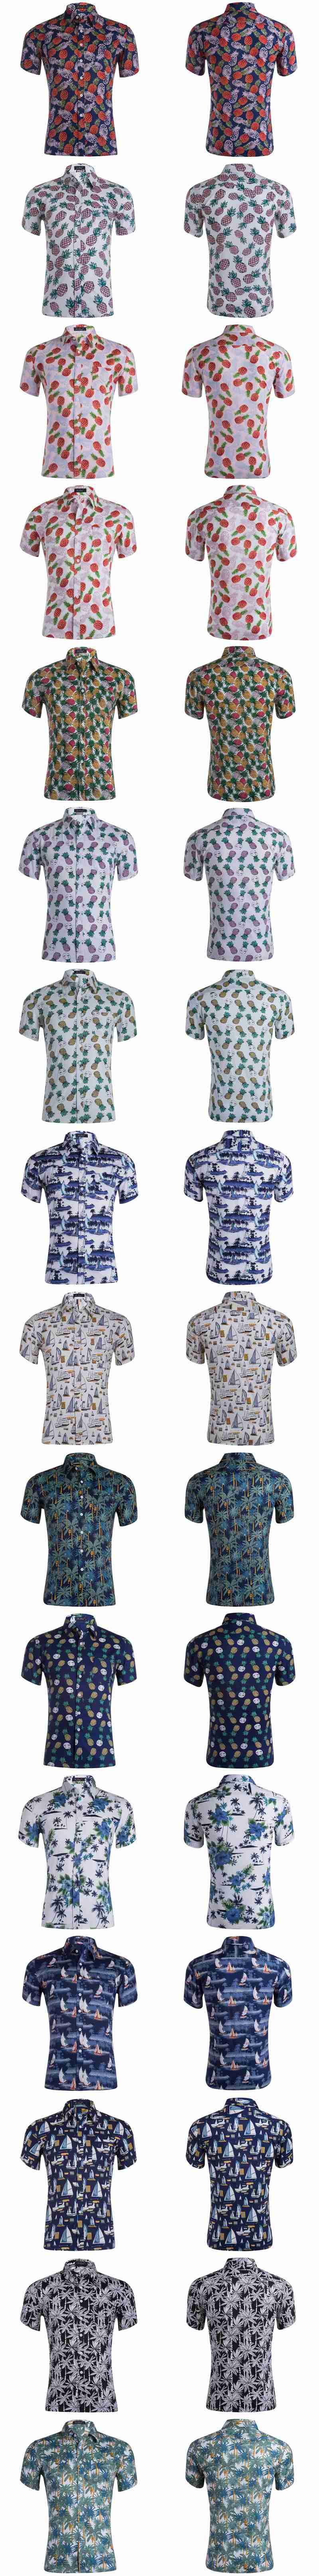 Hoge Kwaliteit Western Plaid Tartan Shirts Voor Mannen Heren Flanellen Lumberjack Check Geborsteld Katoen Casual Shirt